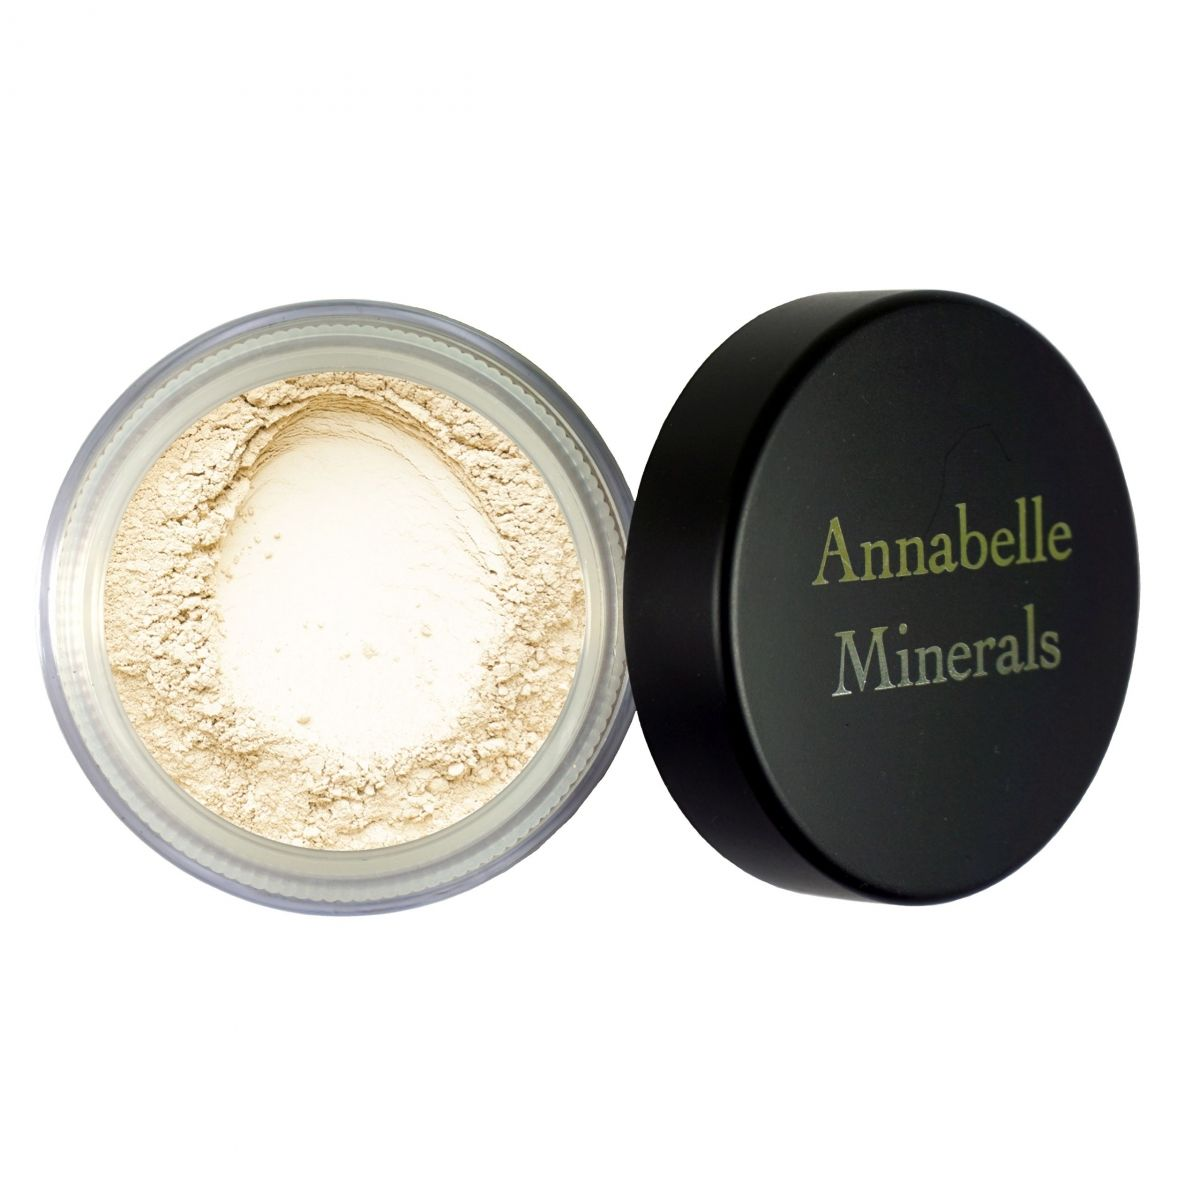 Podkład mineralny - kryjący Golden Fair - 4g - Annabelle Minerals